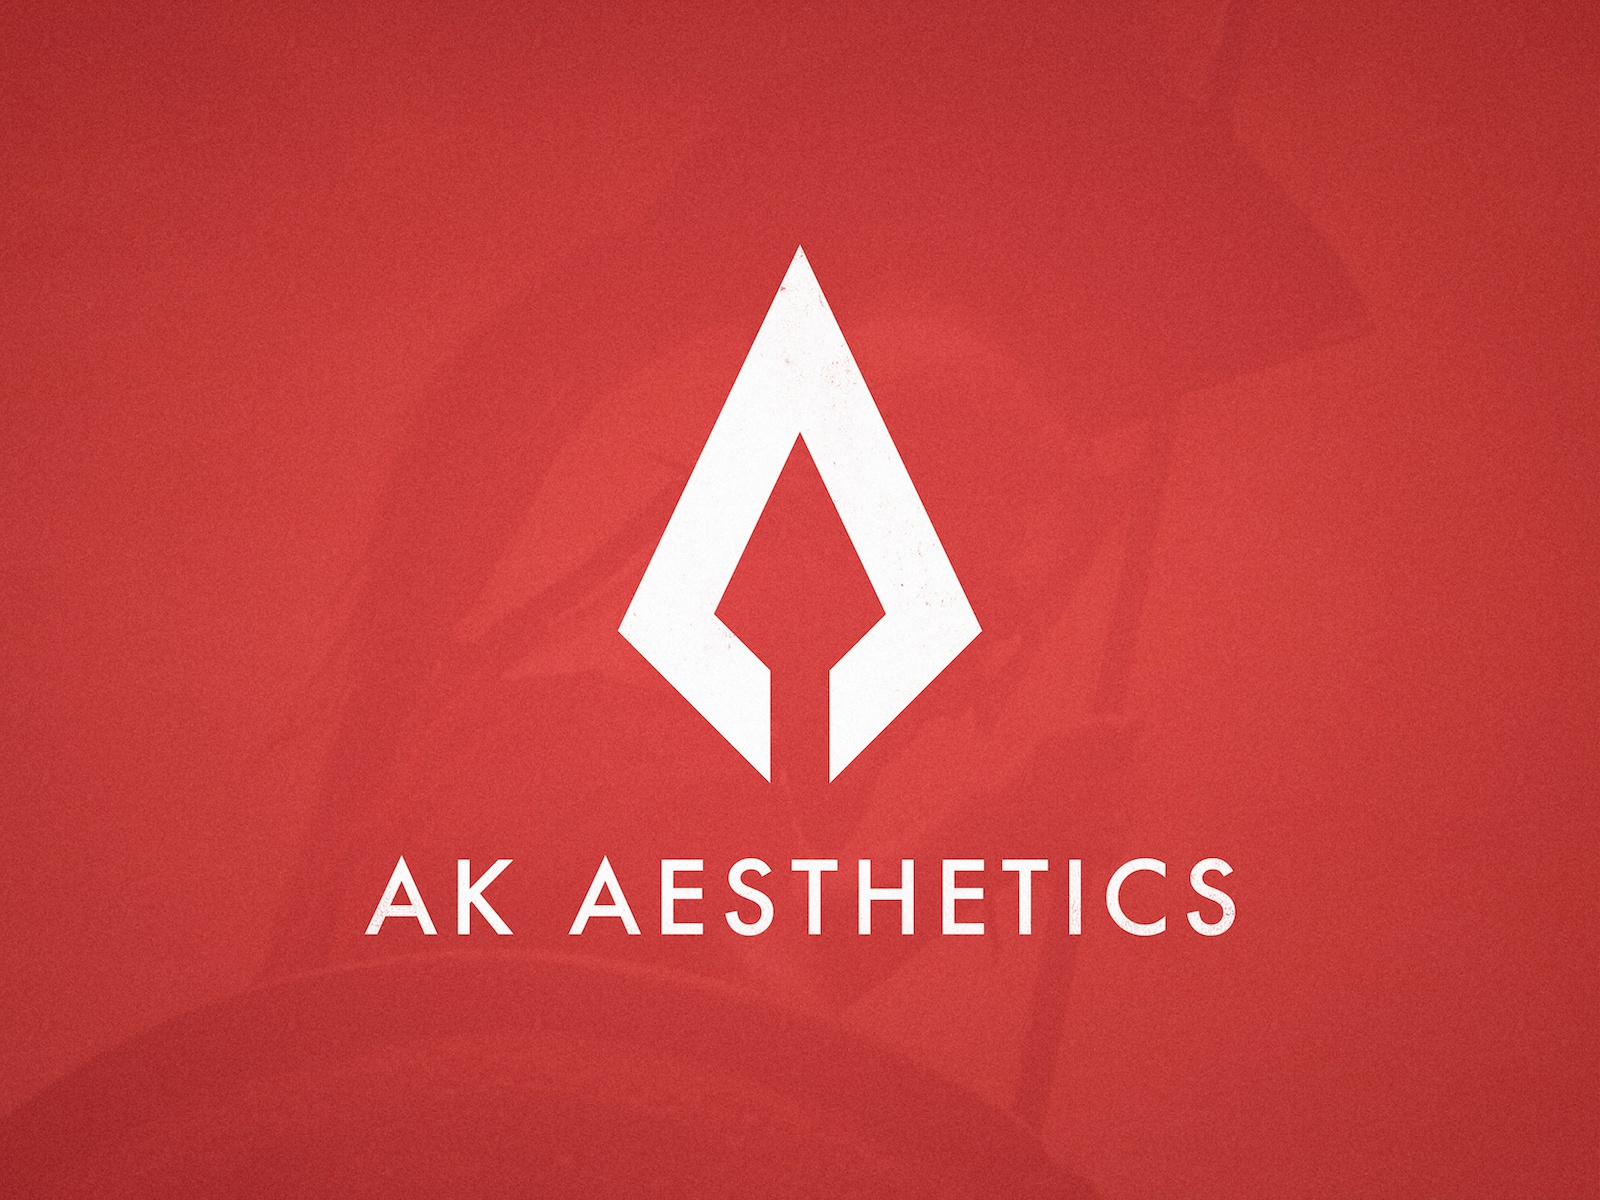 Ak aesthetics